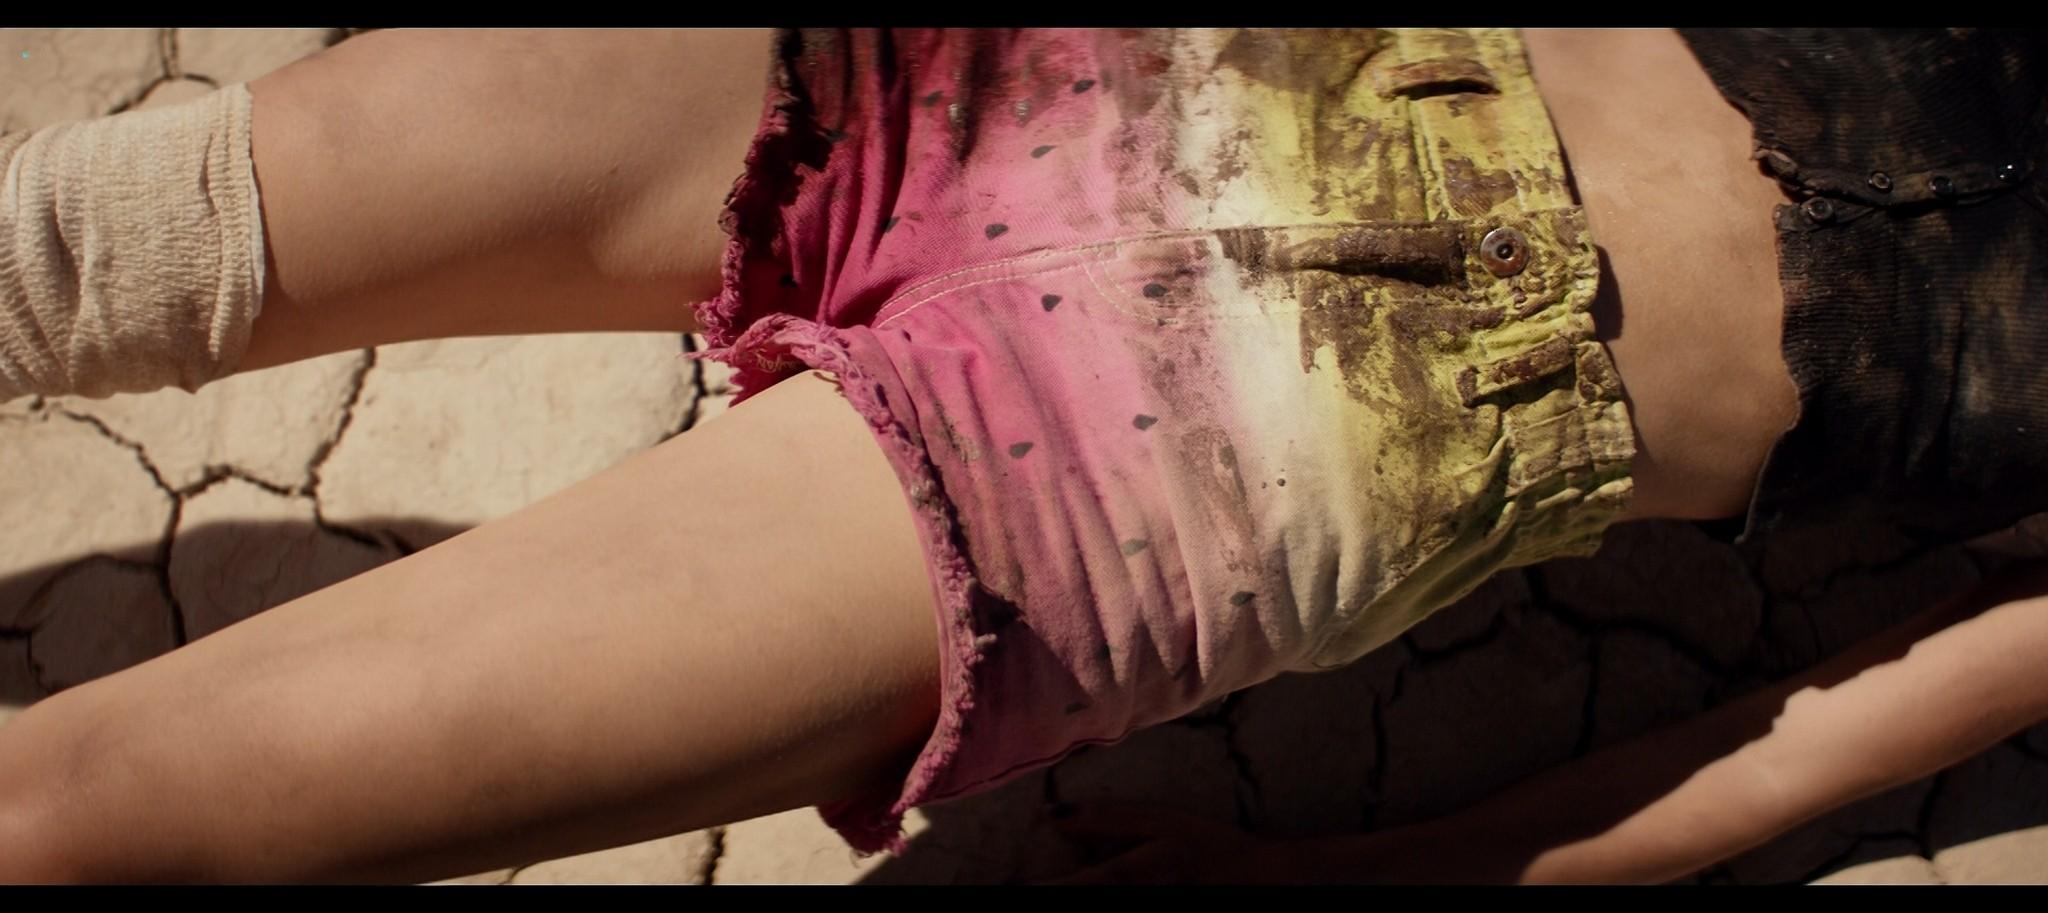 Suki Waterhouse sexy The Bad Batch 2016 1080p BluRay REMUX 14